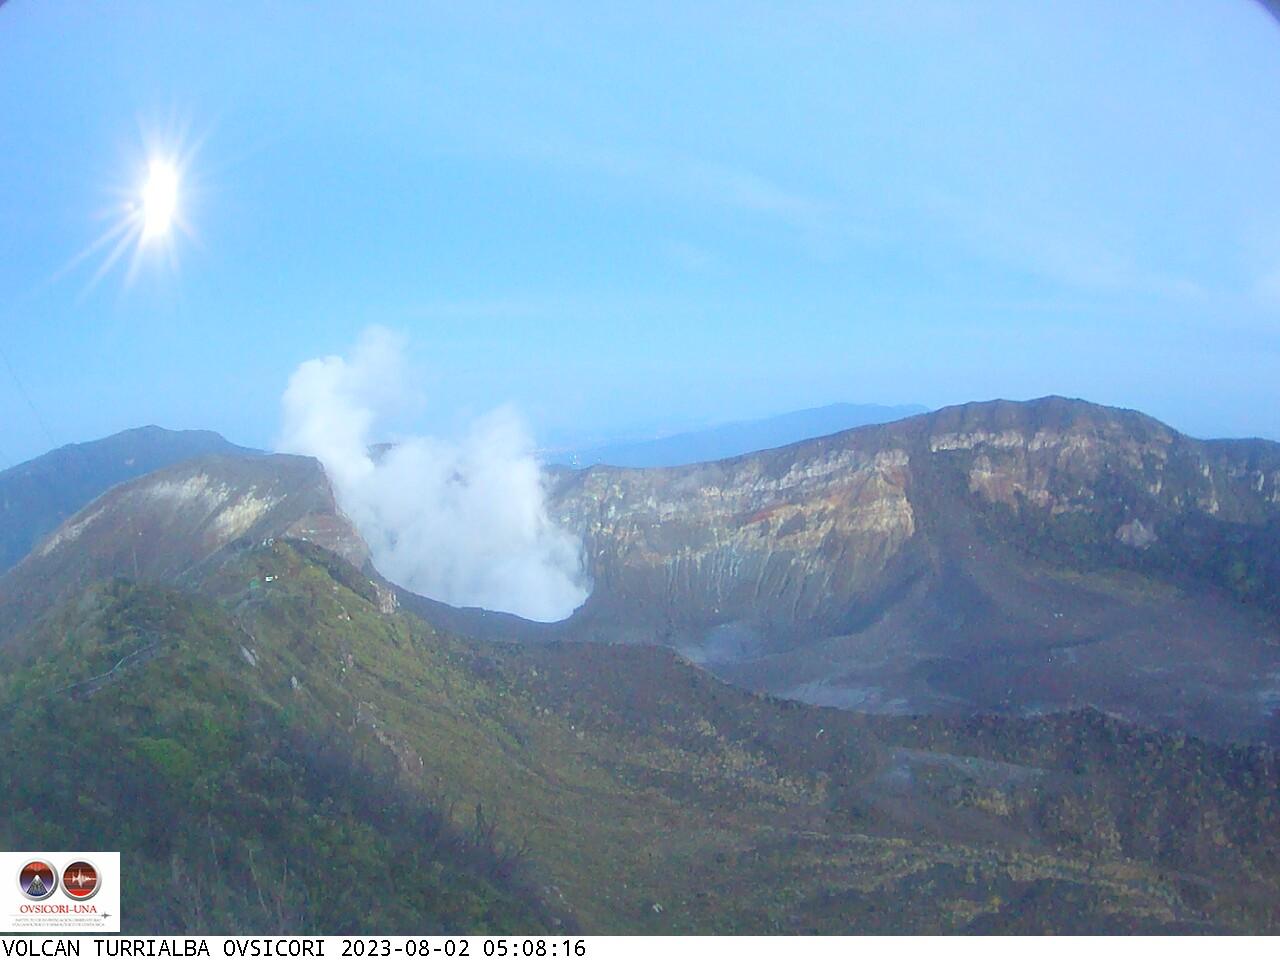 Volcano Turrialba Sun. 05:08